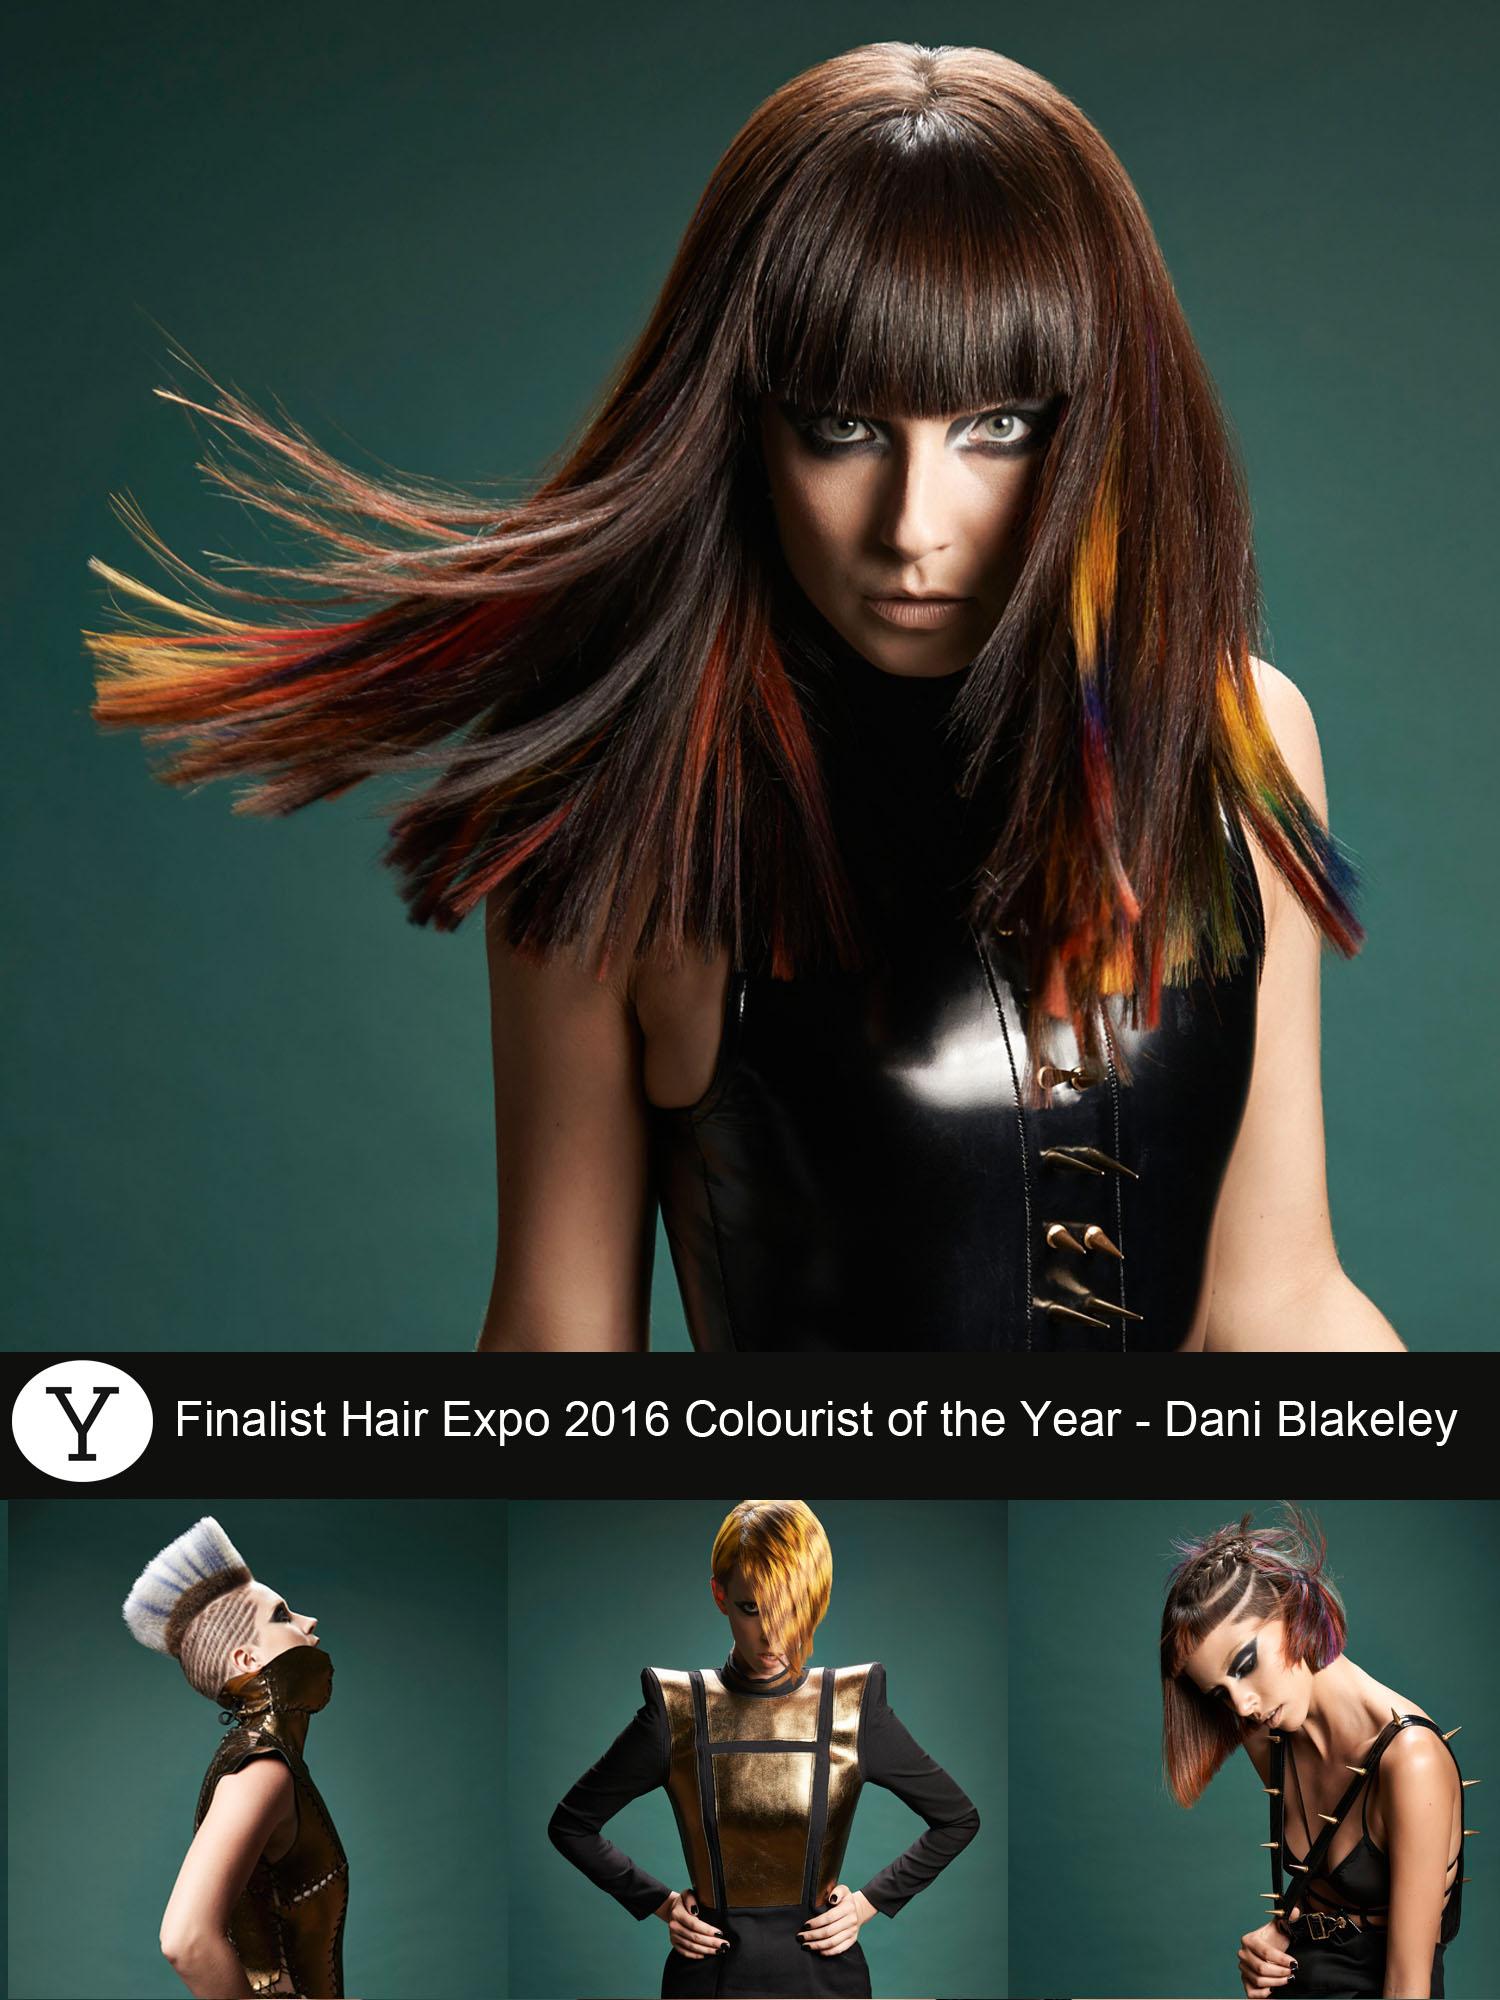 yoshiko hair hair expo finalist colorist 2016